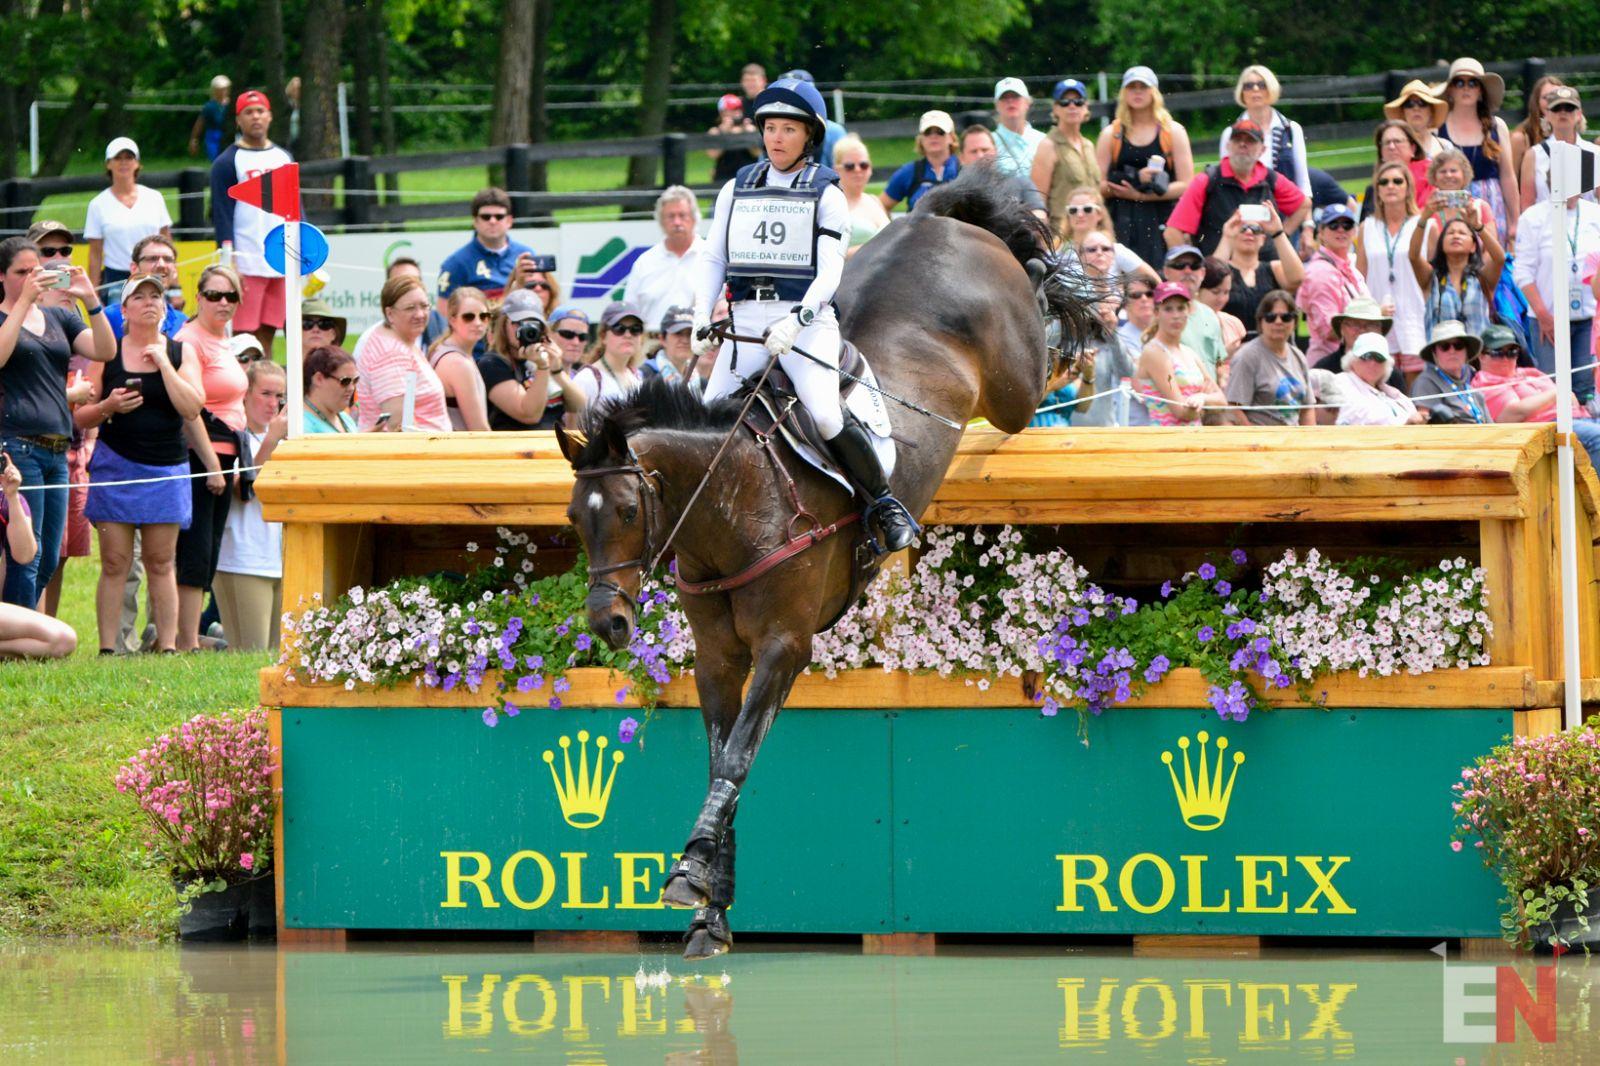 Rolex17_LT-1896.jpg